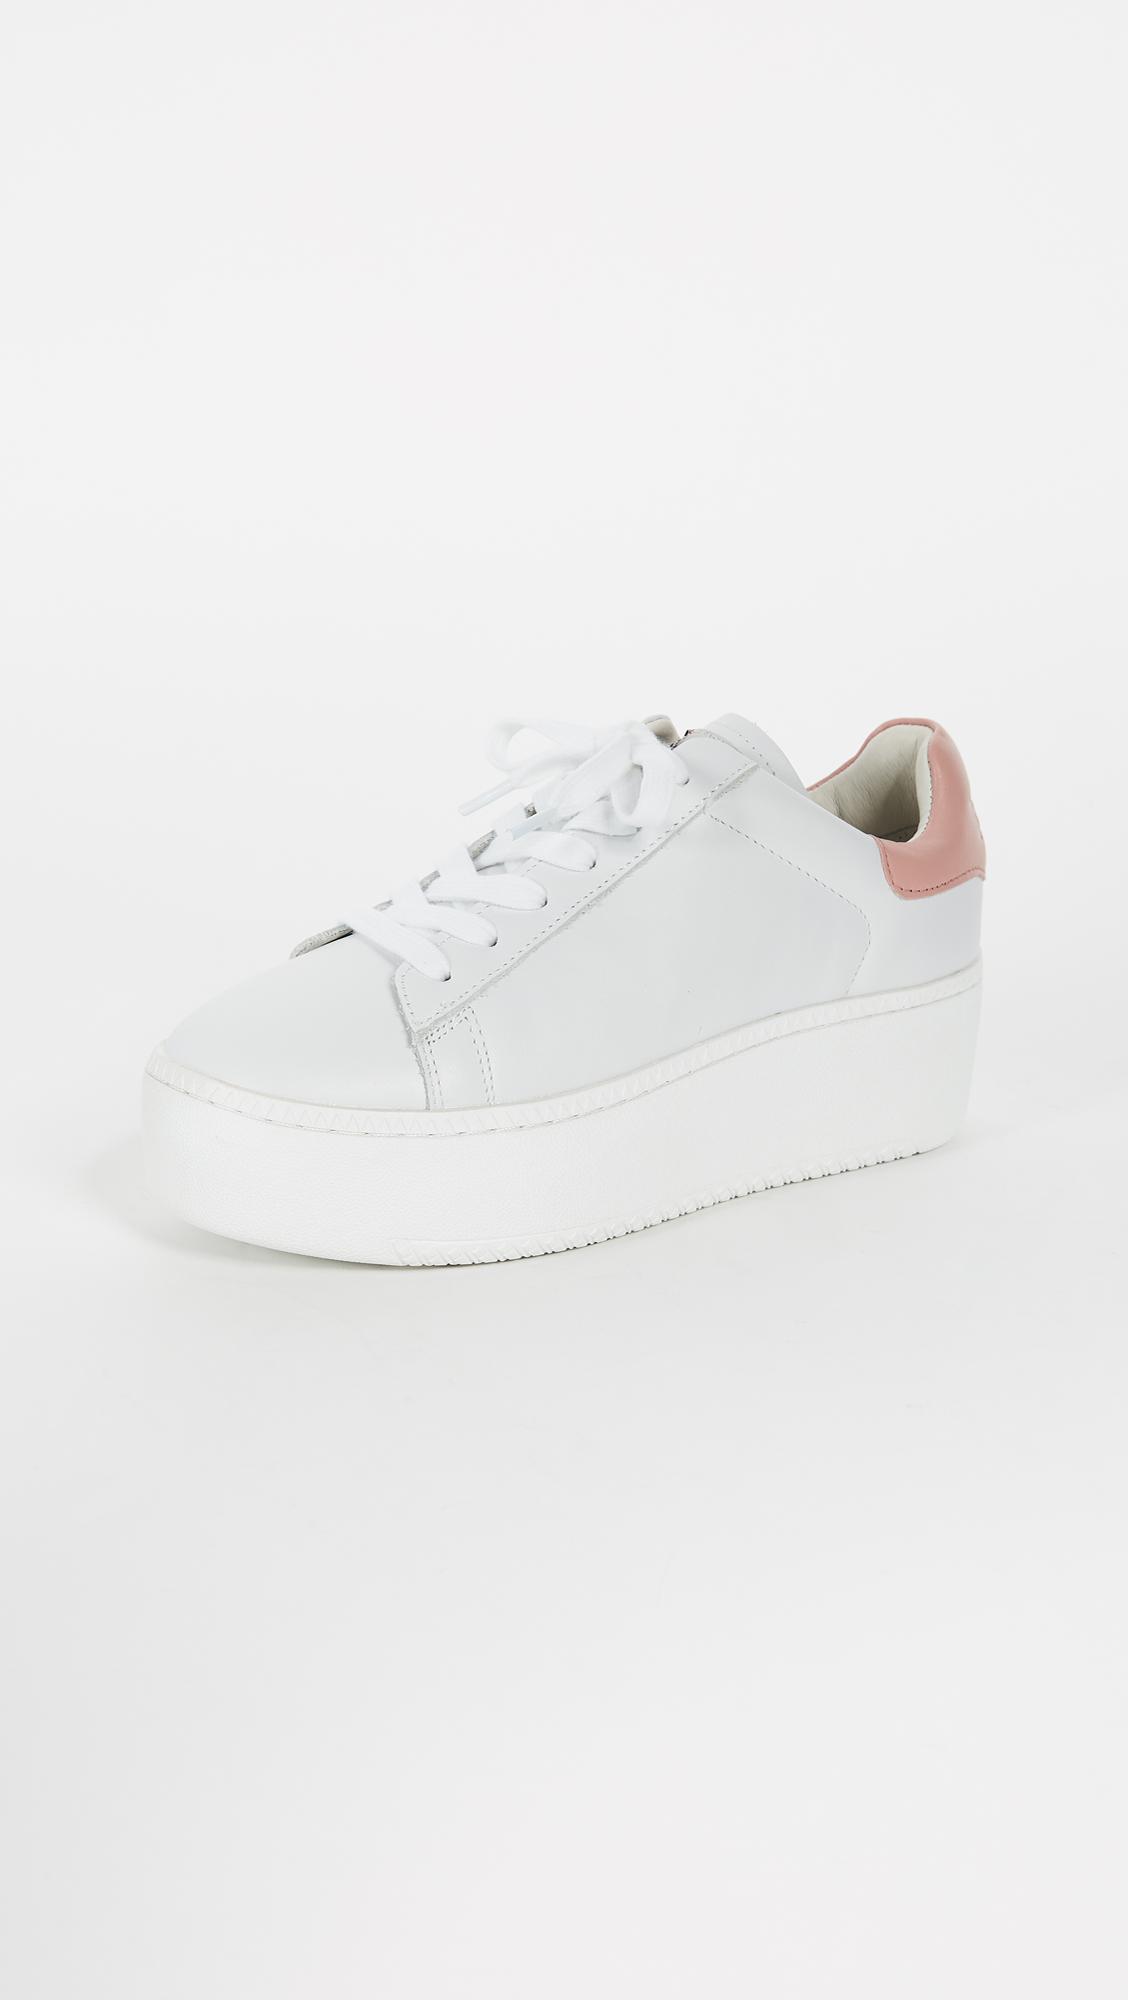 Womens Athletic Shoes ash black jane gun xi4u23i7